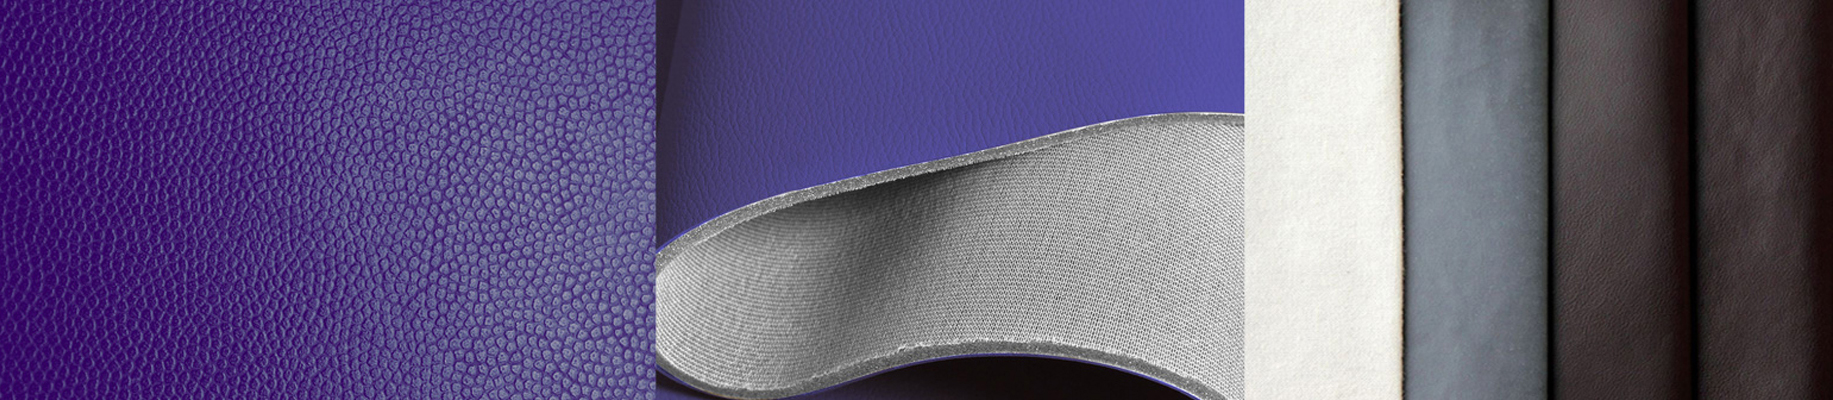 Kunstlederbezug-Panorama.jpg